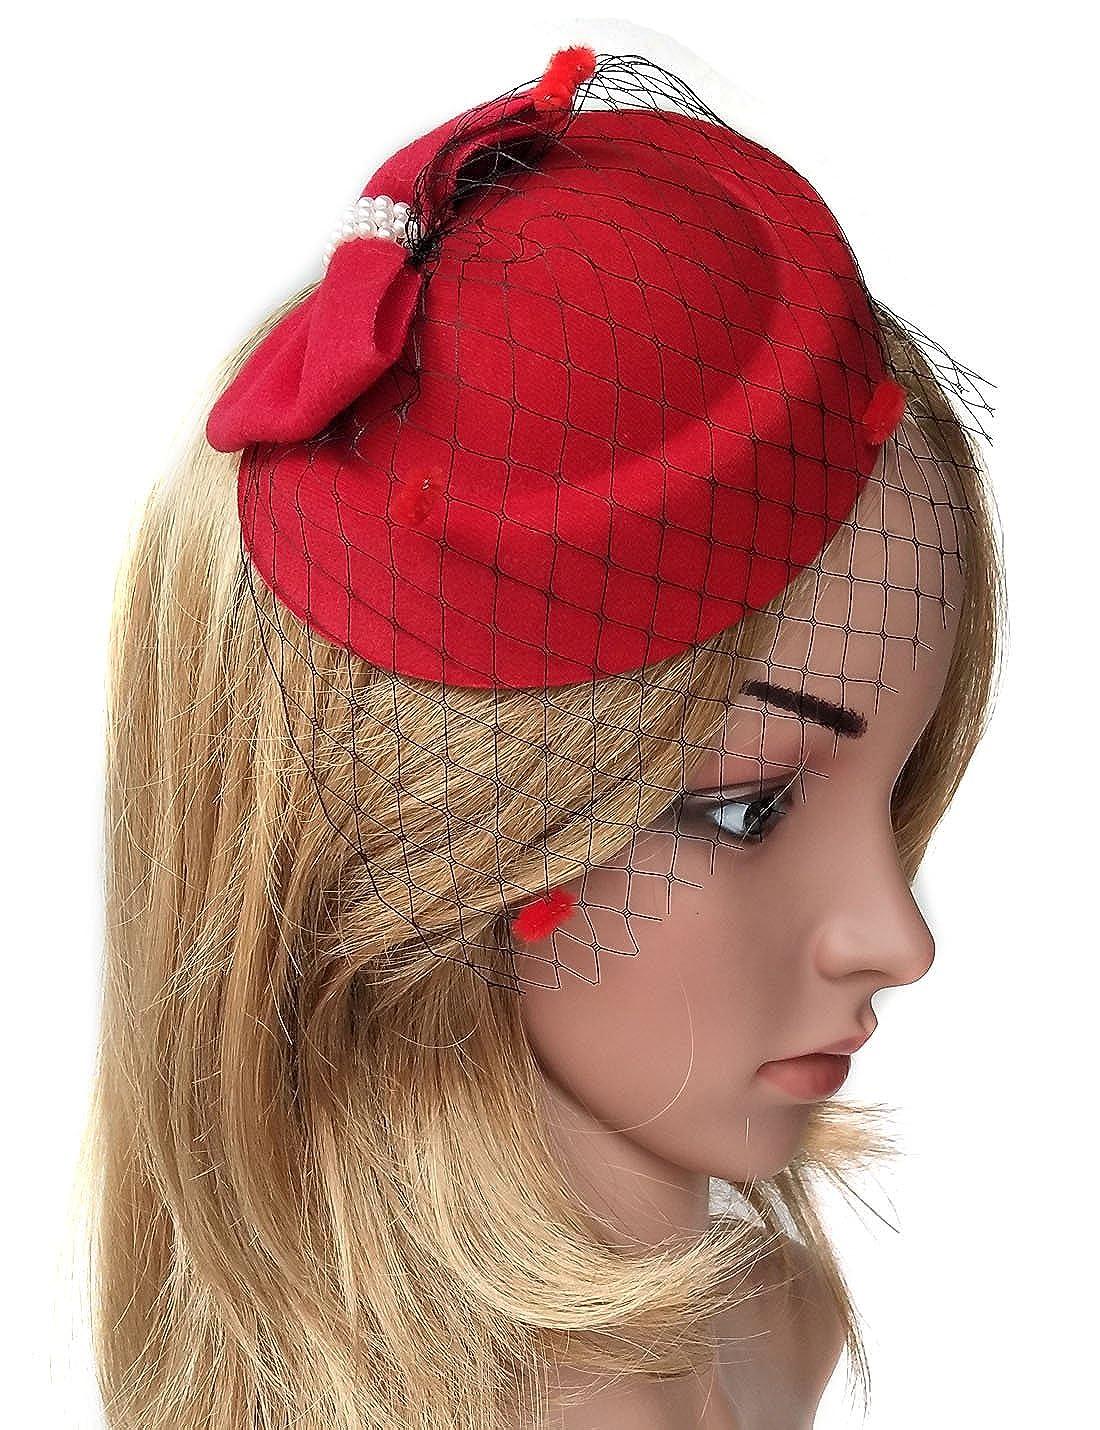 Biruil Fascinator Hats for Women Pillbox Hat Veil Headband Clip for Tea Party Headwear